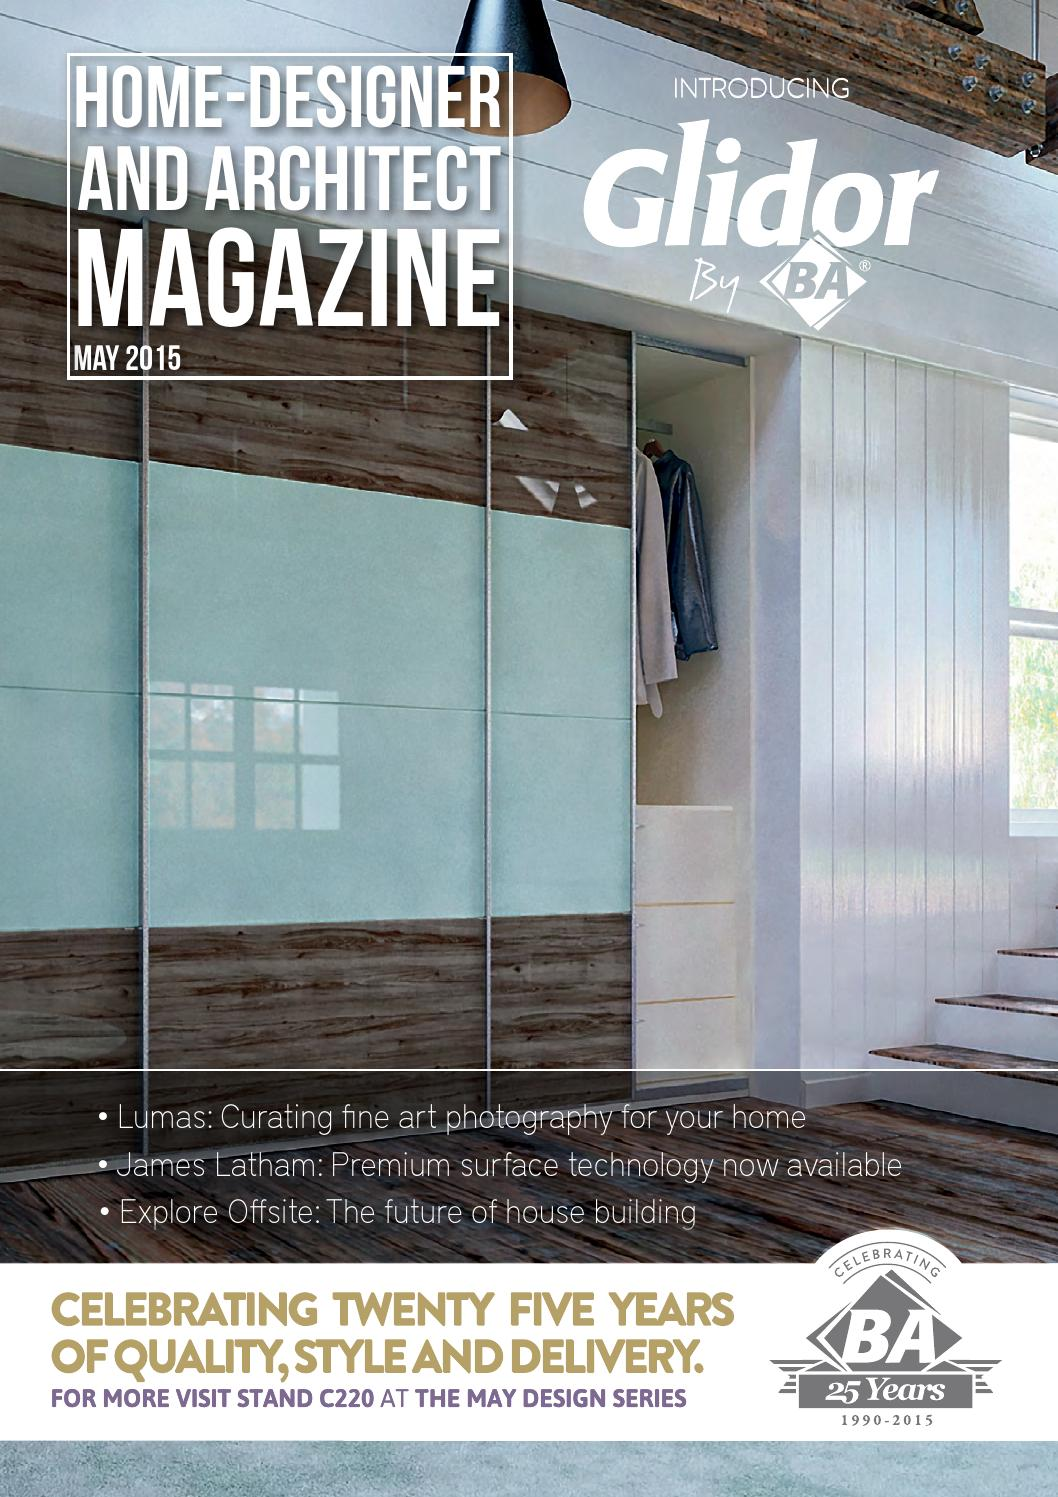 Home Designer and Architect - May 2015 by Jet Digital Media Ltd - issuu